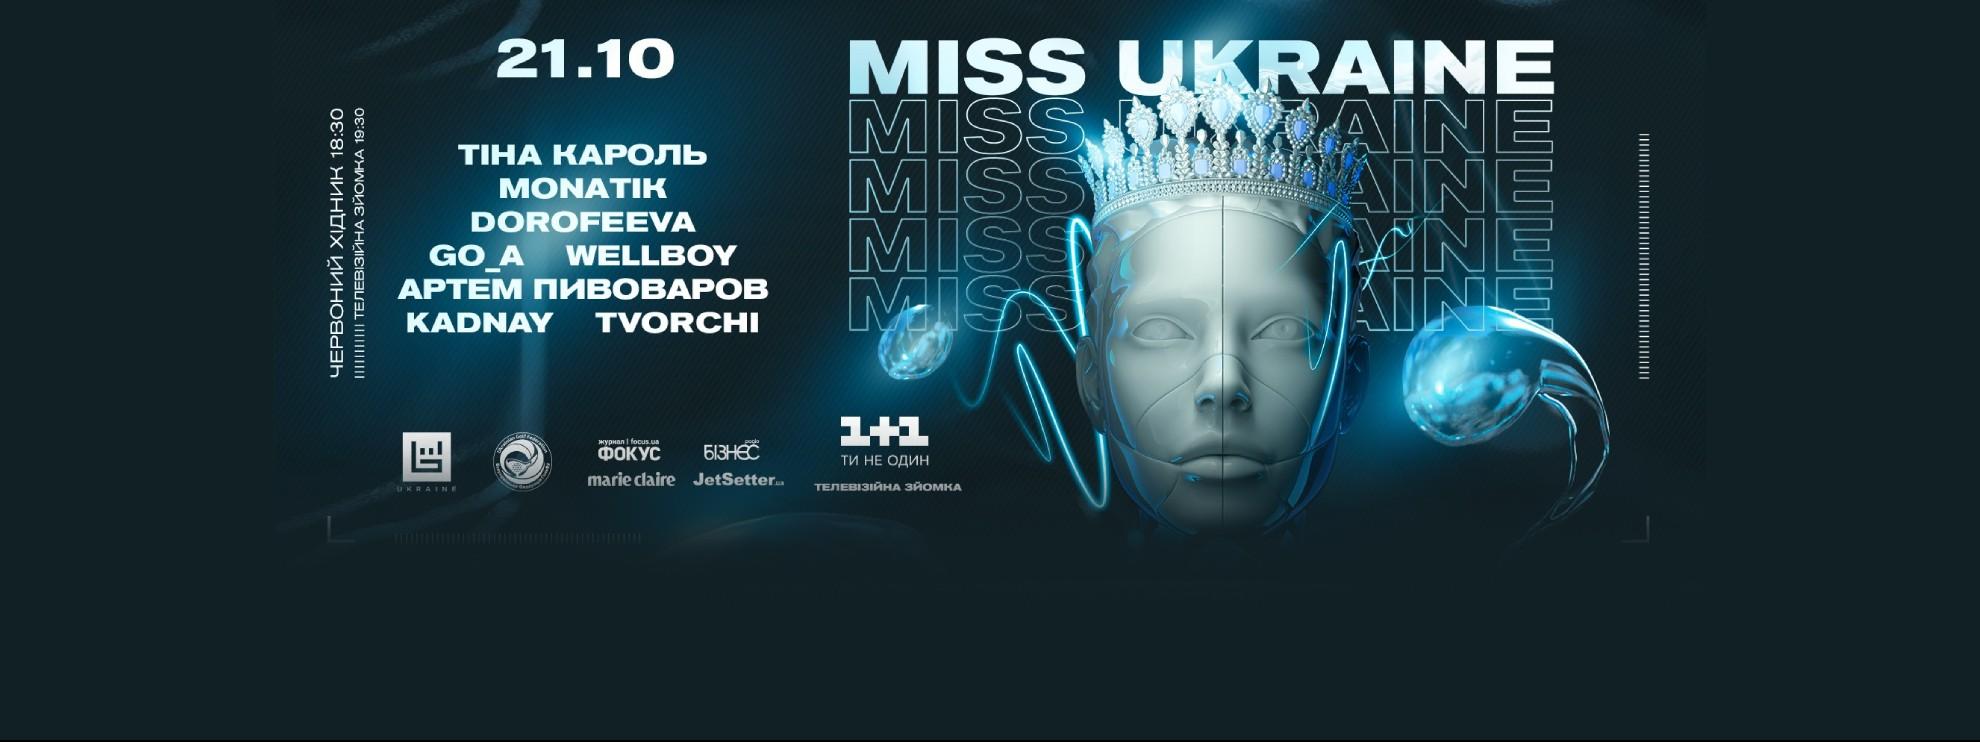 подія Miss Ukraine 2021 (Міс Україна 2021)